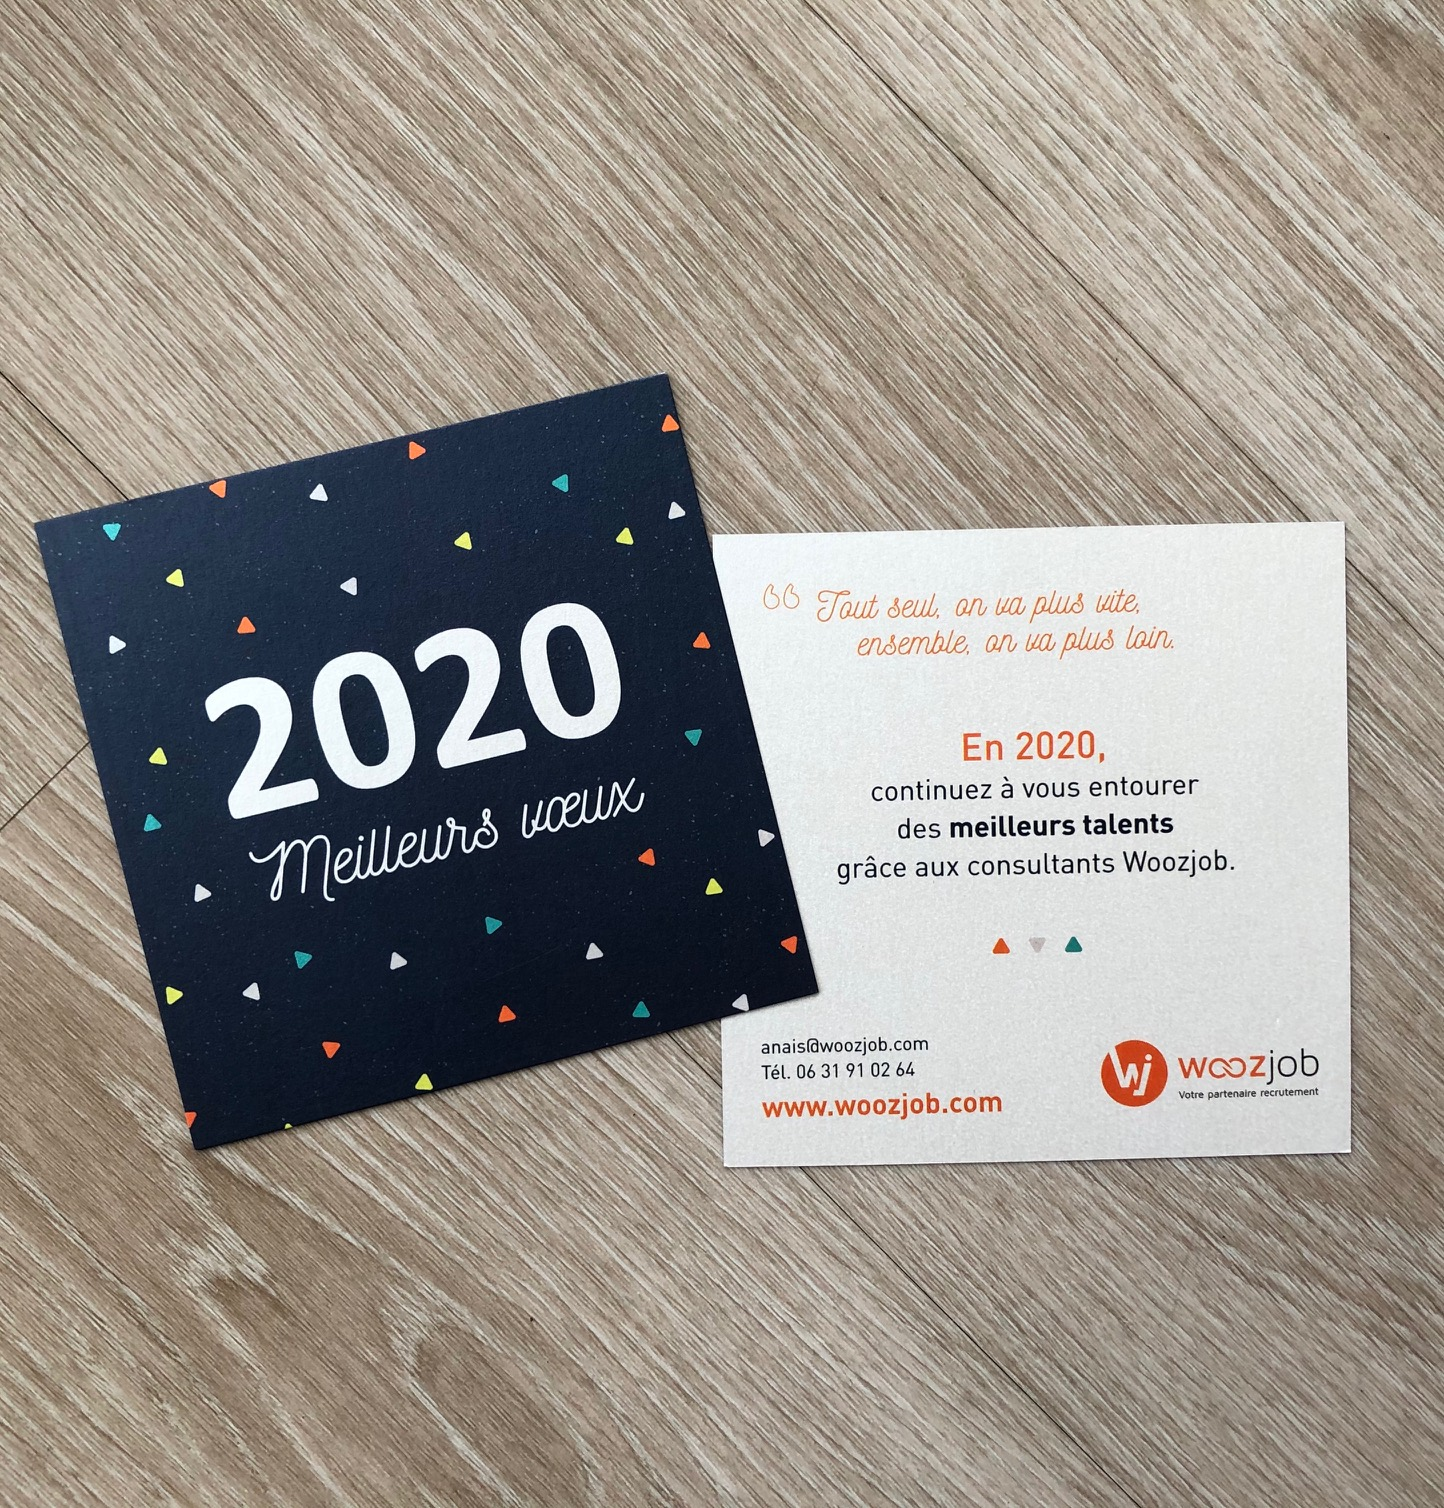 Vœux 2020 WOOZJOB